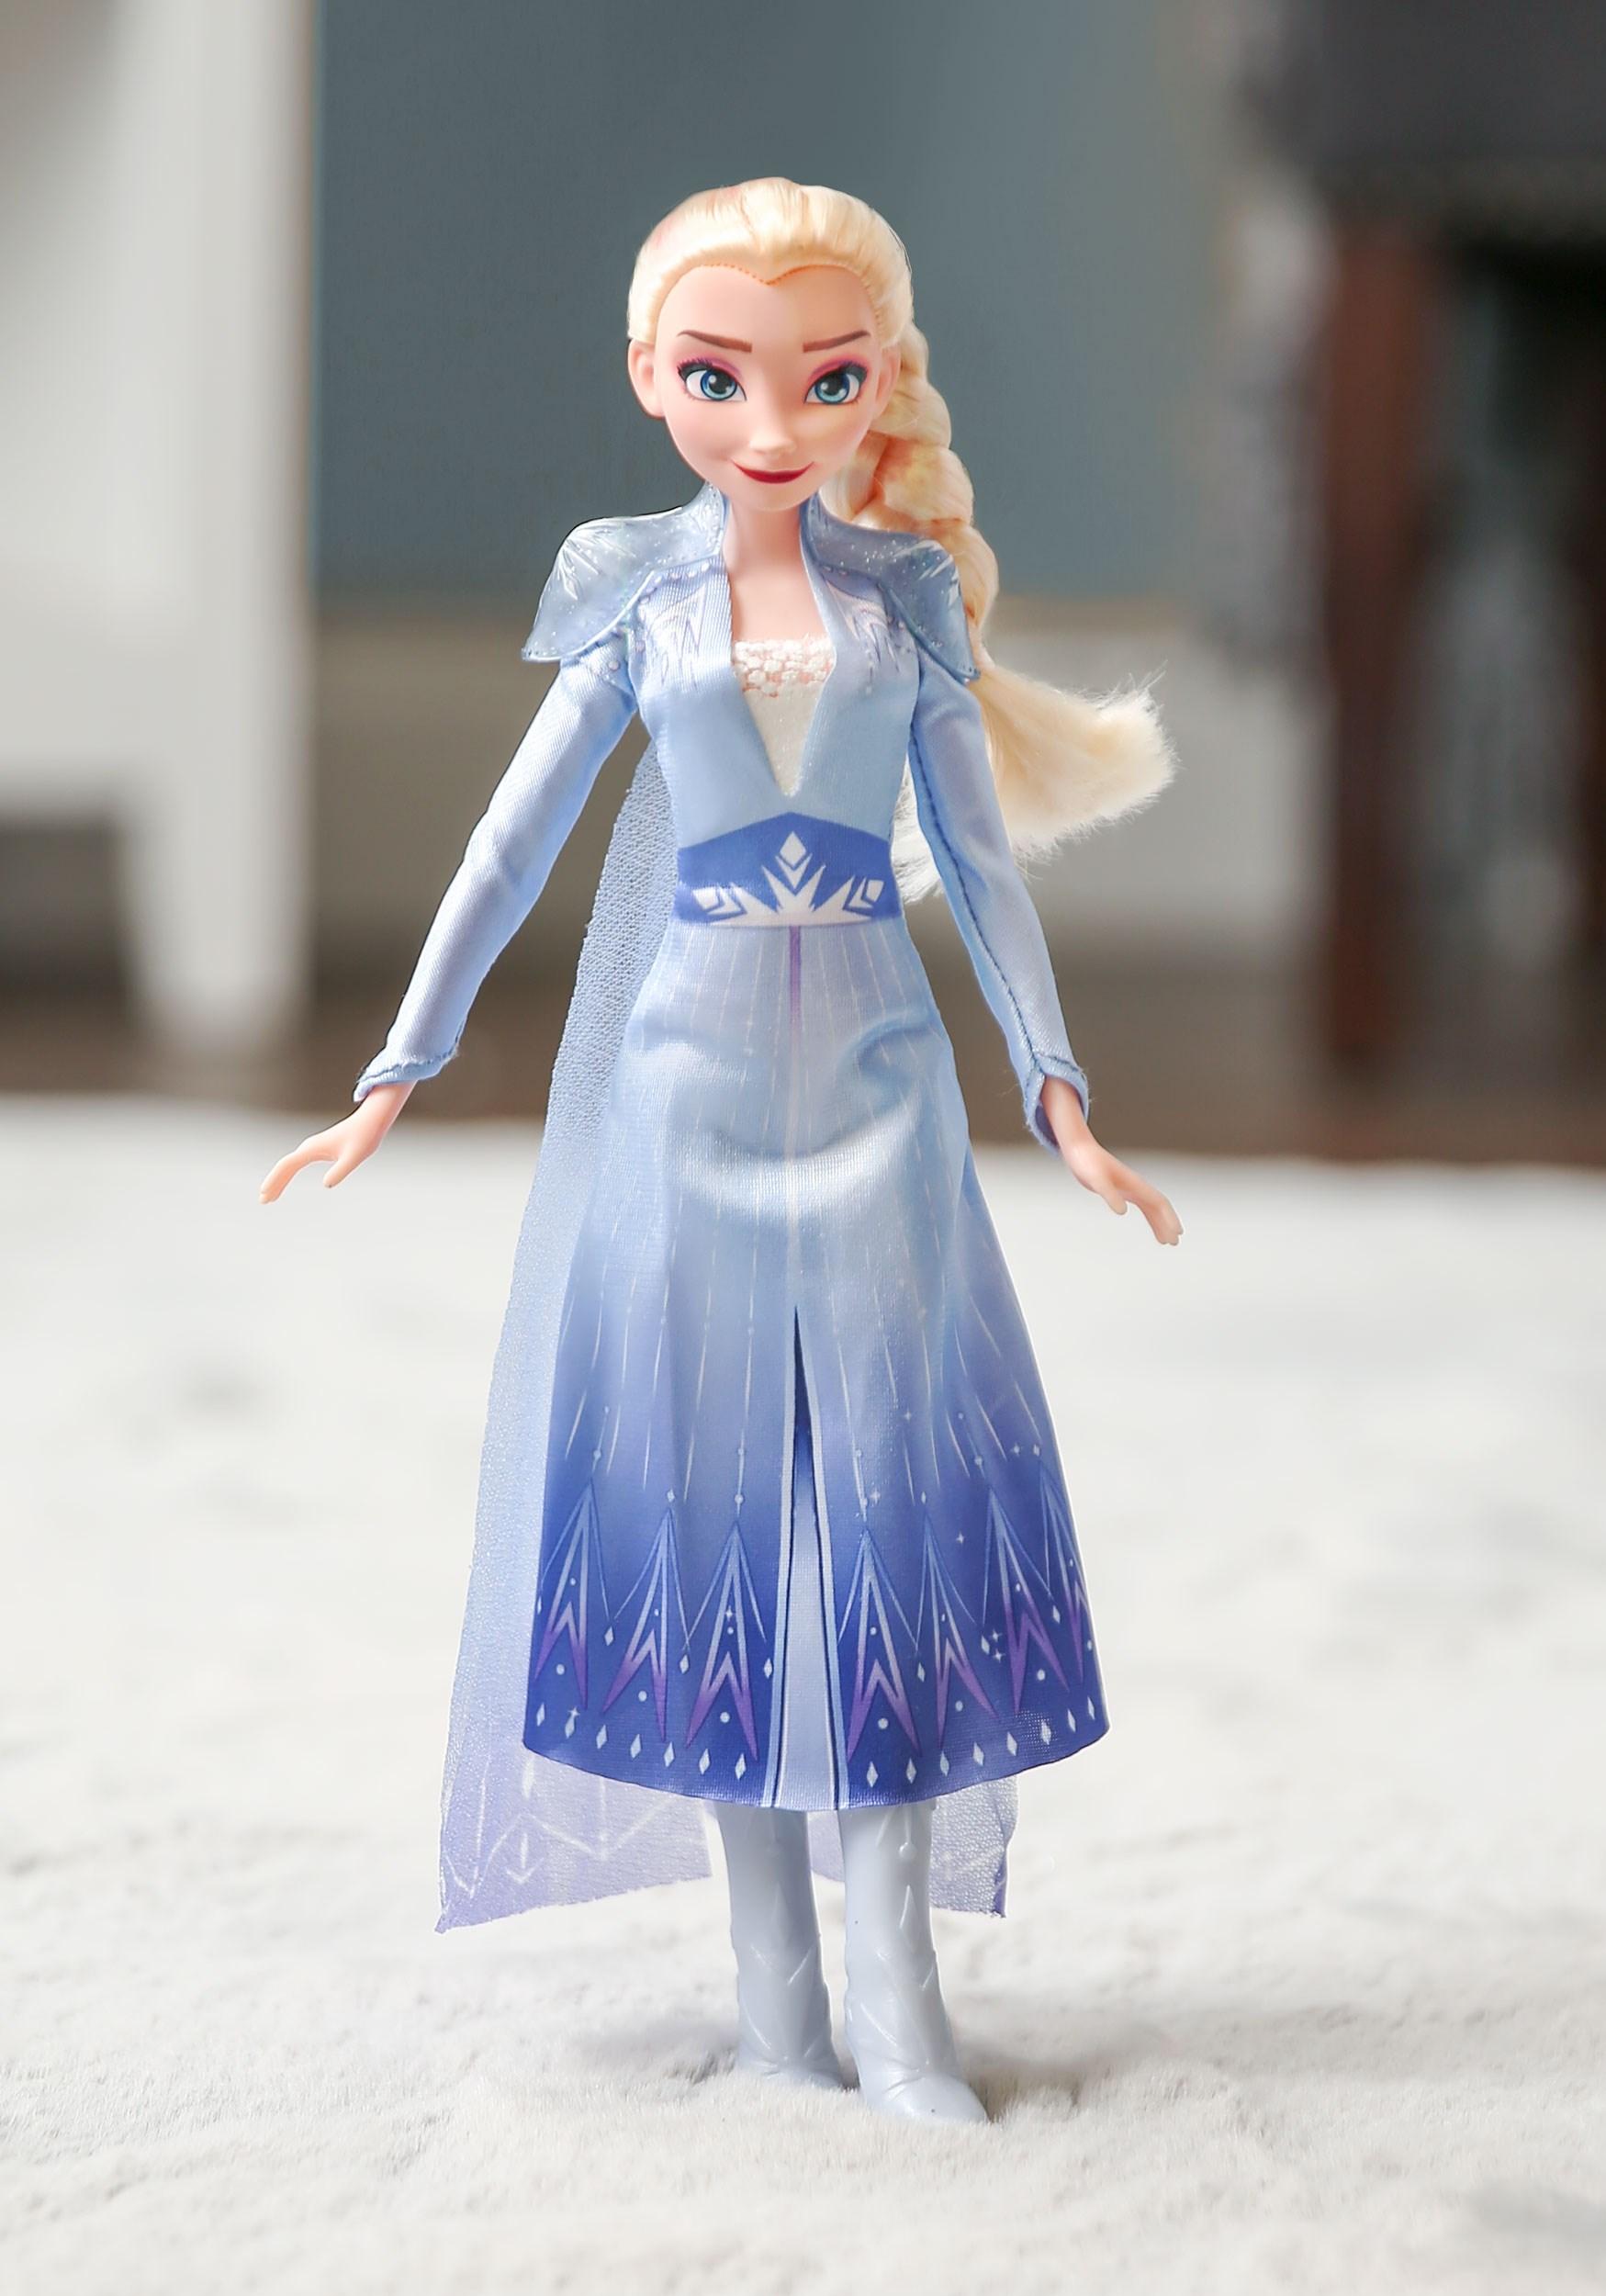 Elsa Disney Store Limited Edition doll - Frozen Photo